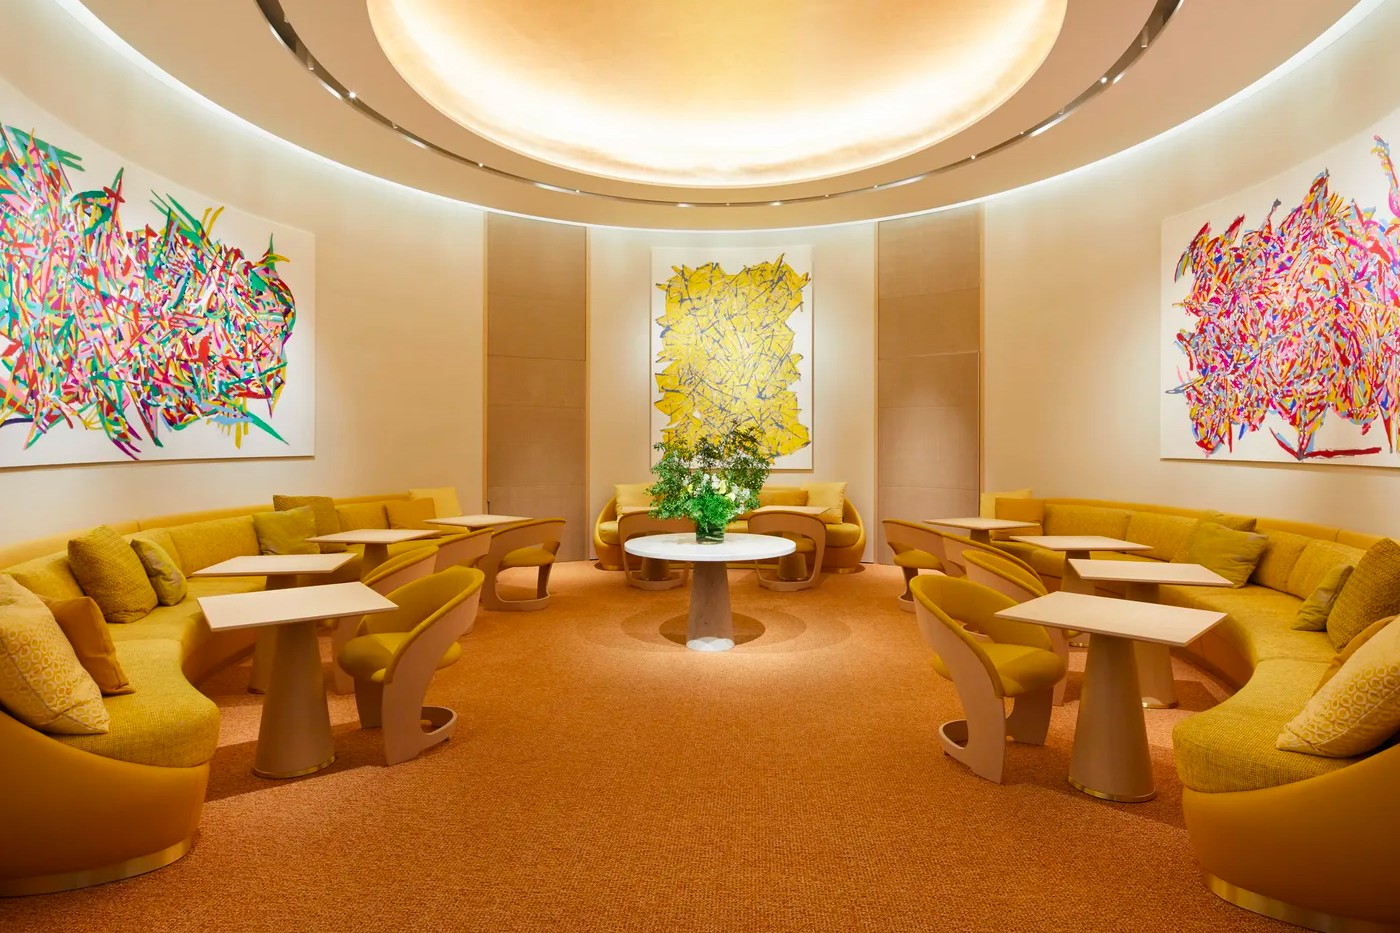 Louis Vuitton restaurant 3